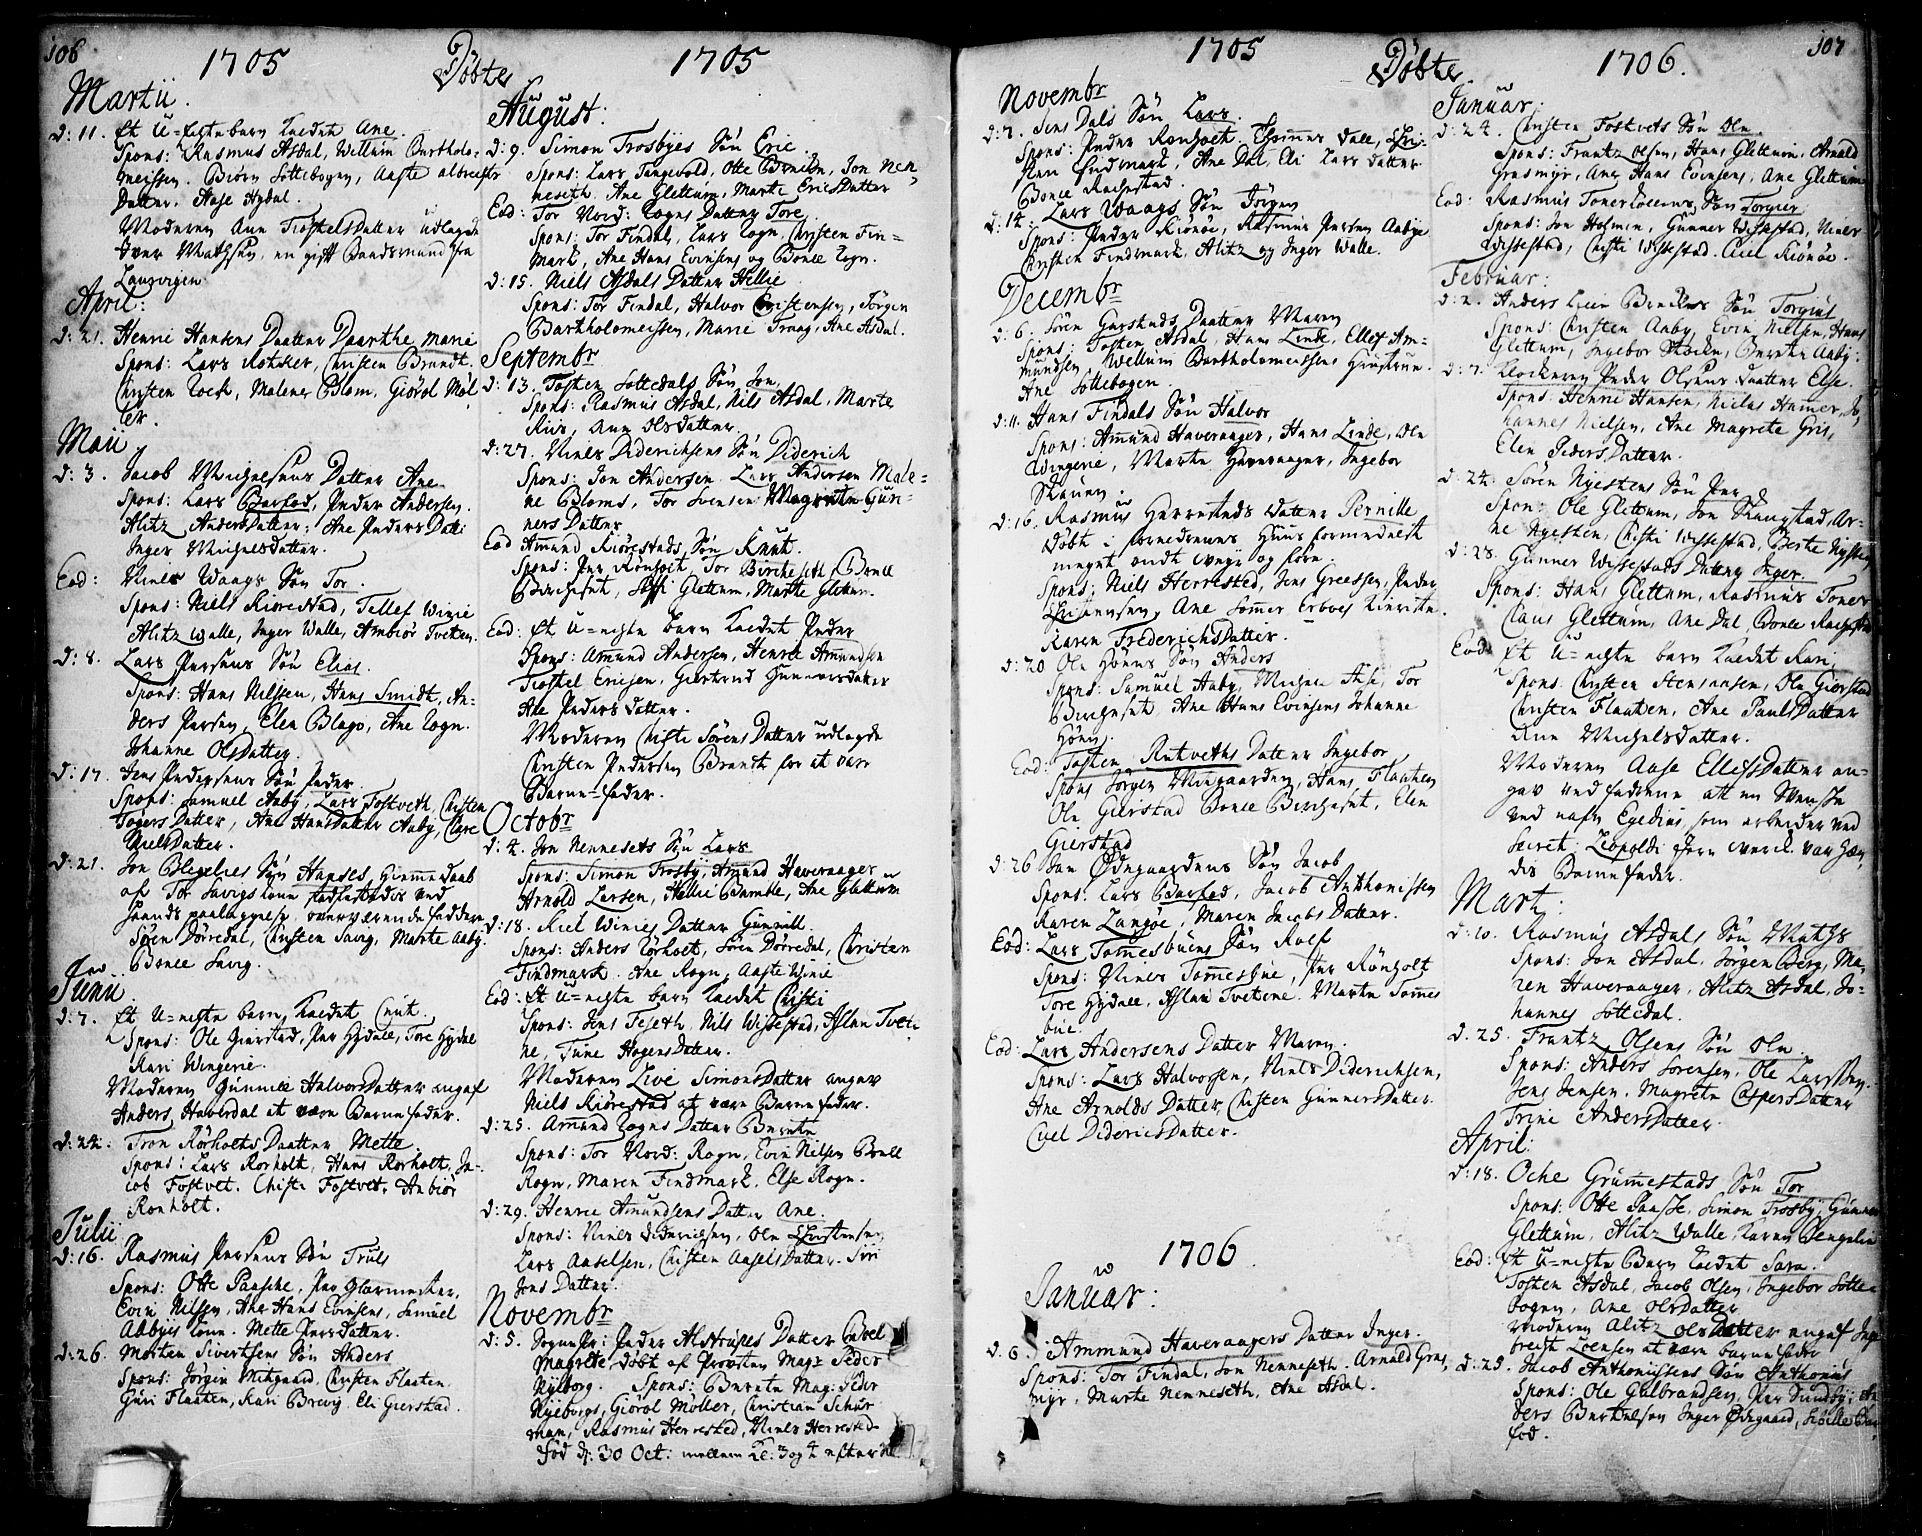 SAKO, Bamble kirkebøker, F/Fa/L0001: Ministerialbok nr. I 1, 1702-1774, s. 106-107